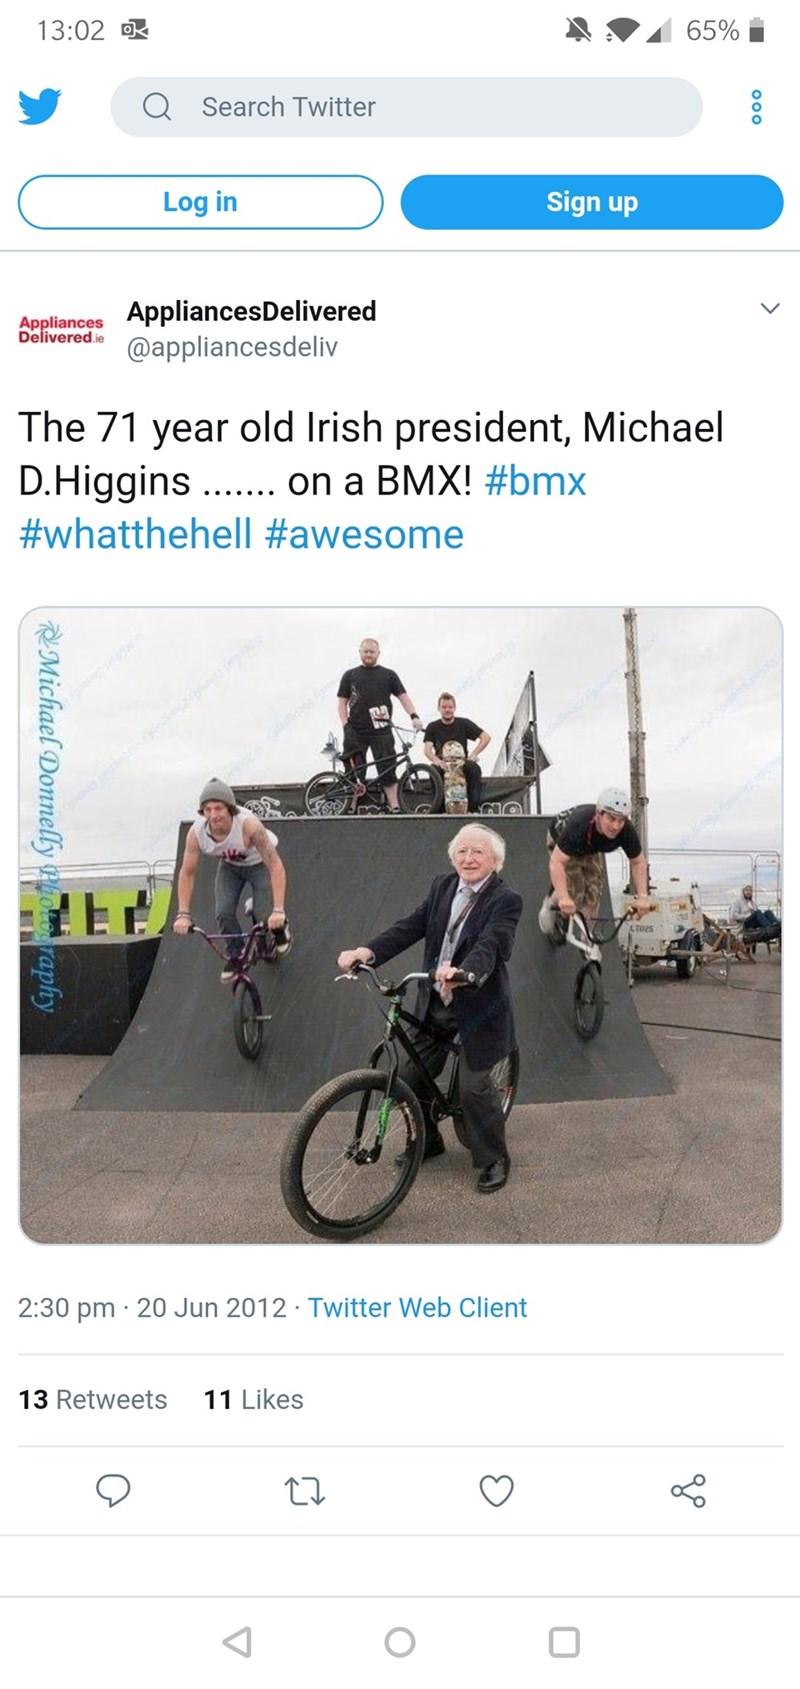 Tweet - The 71 year old Irish president, Michael D.Higgins.. on a BMX!